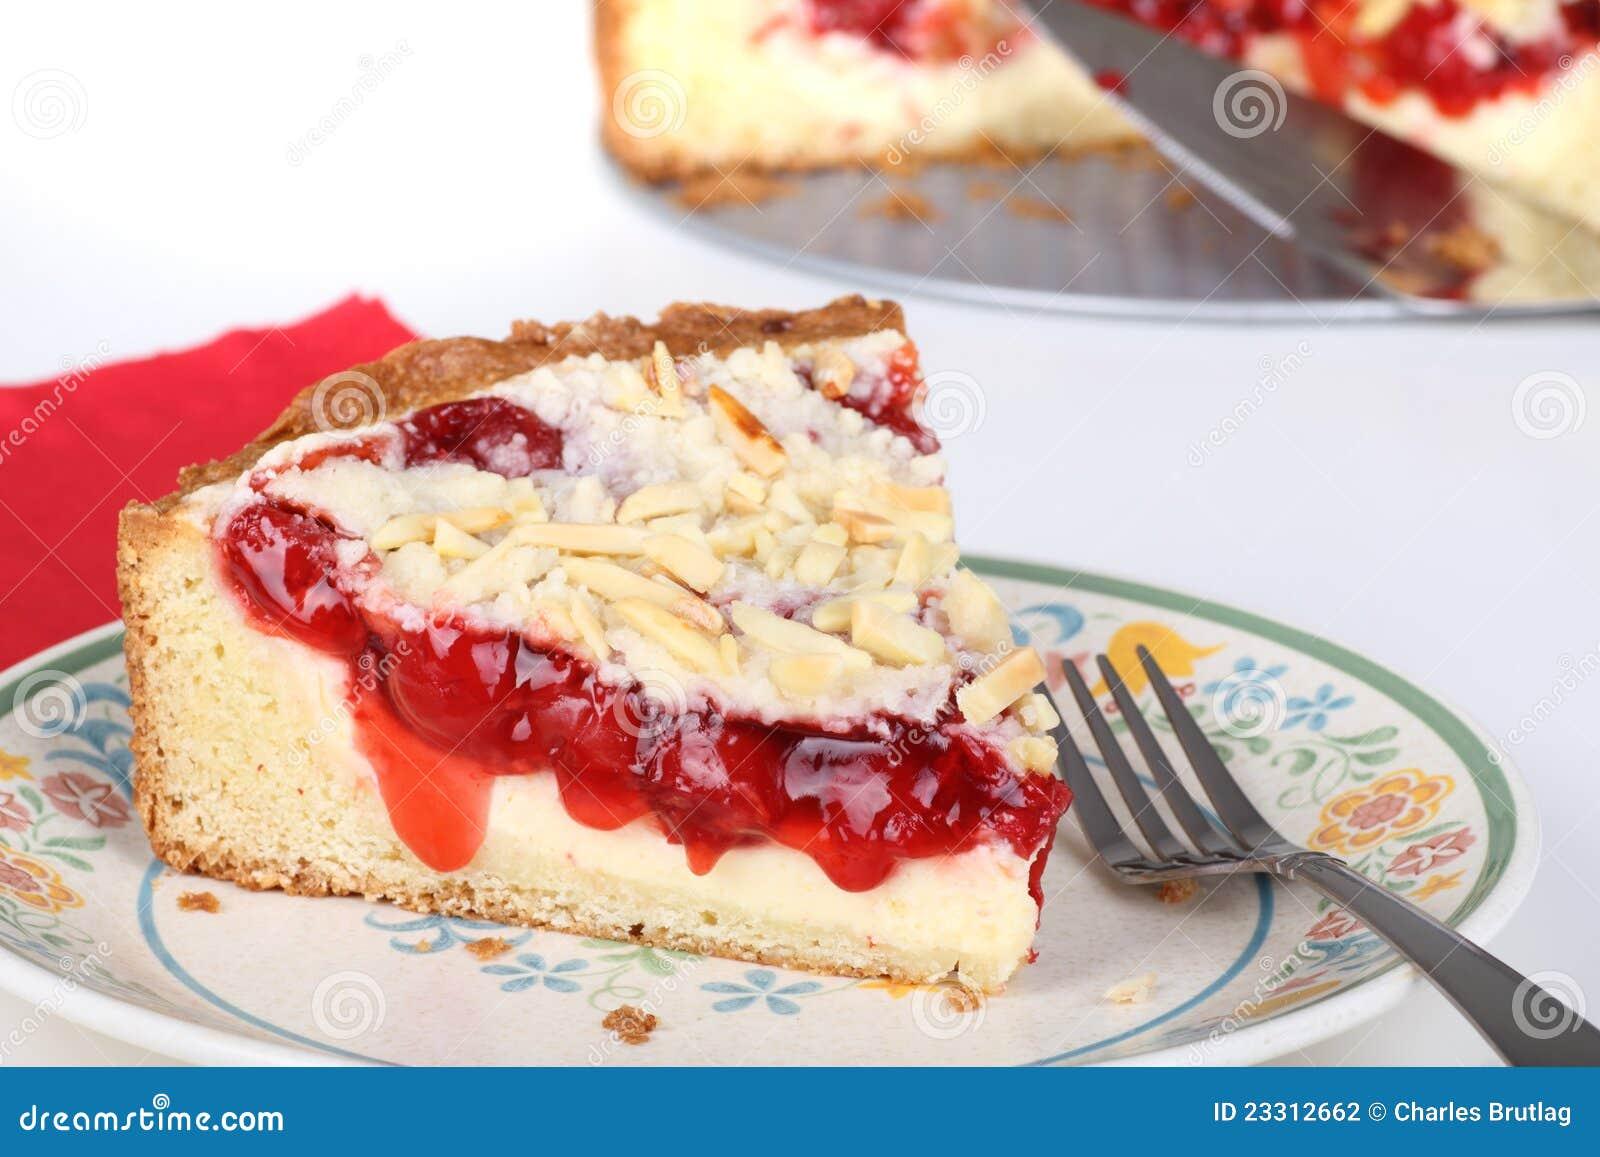 Cherry Cream Cheese Coffe Cake Stock Photography - Image: 23312662